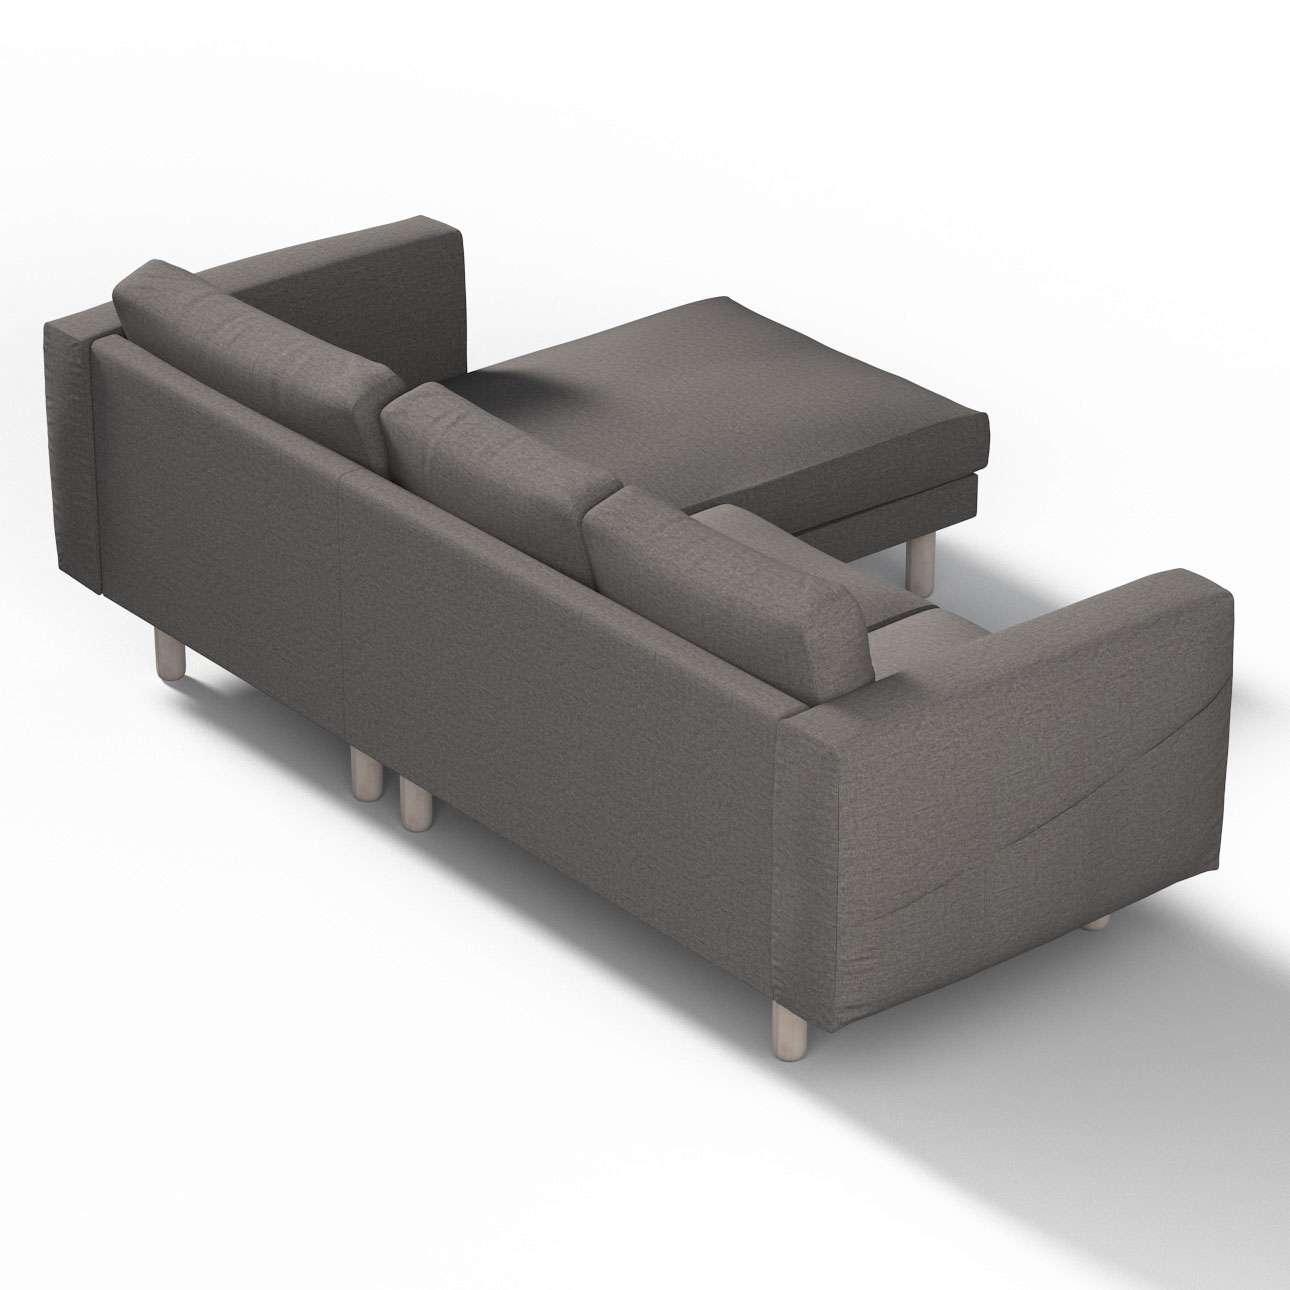 norsborg bezug f r 3 sitzer sofa mit recamiere grau dekoria. Black Bedroom Furniture Sets. Home Design Ideas